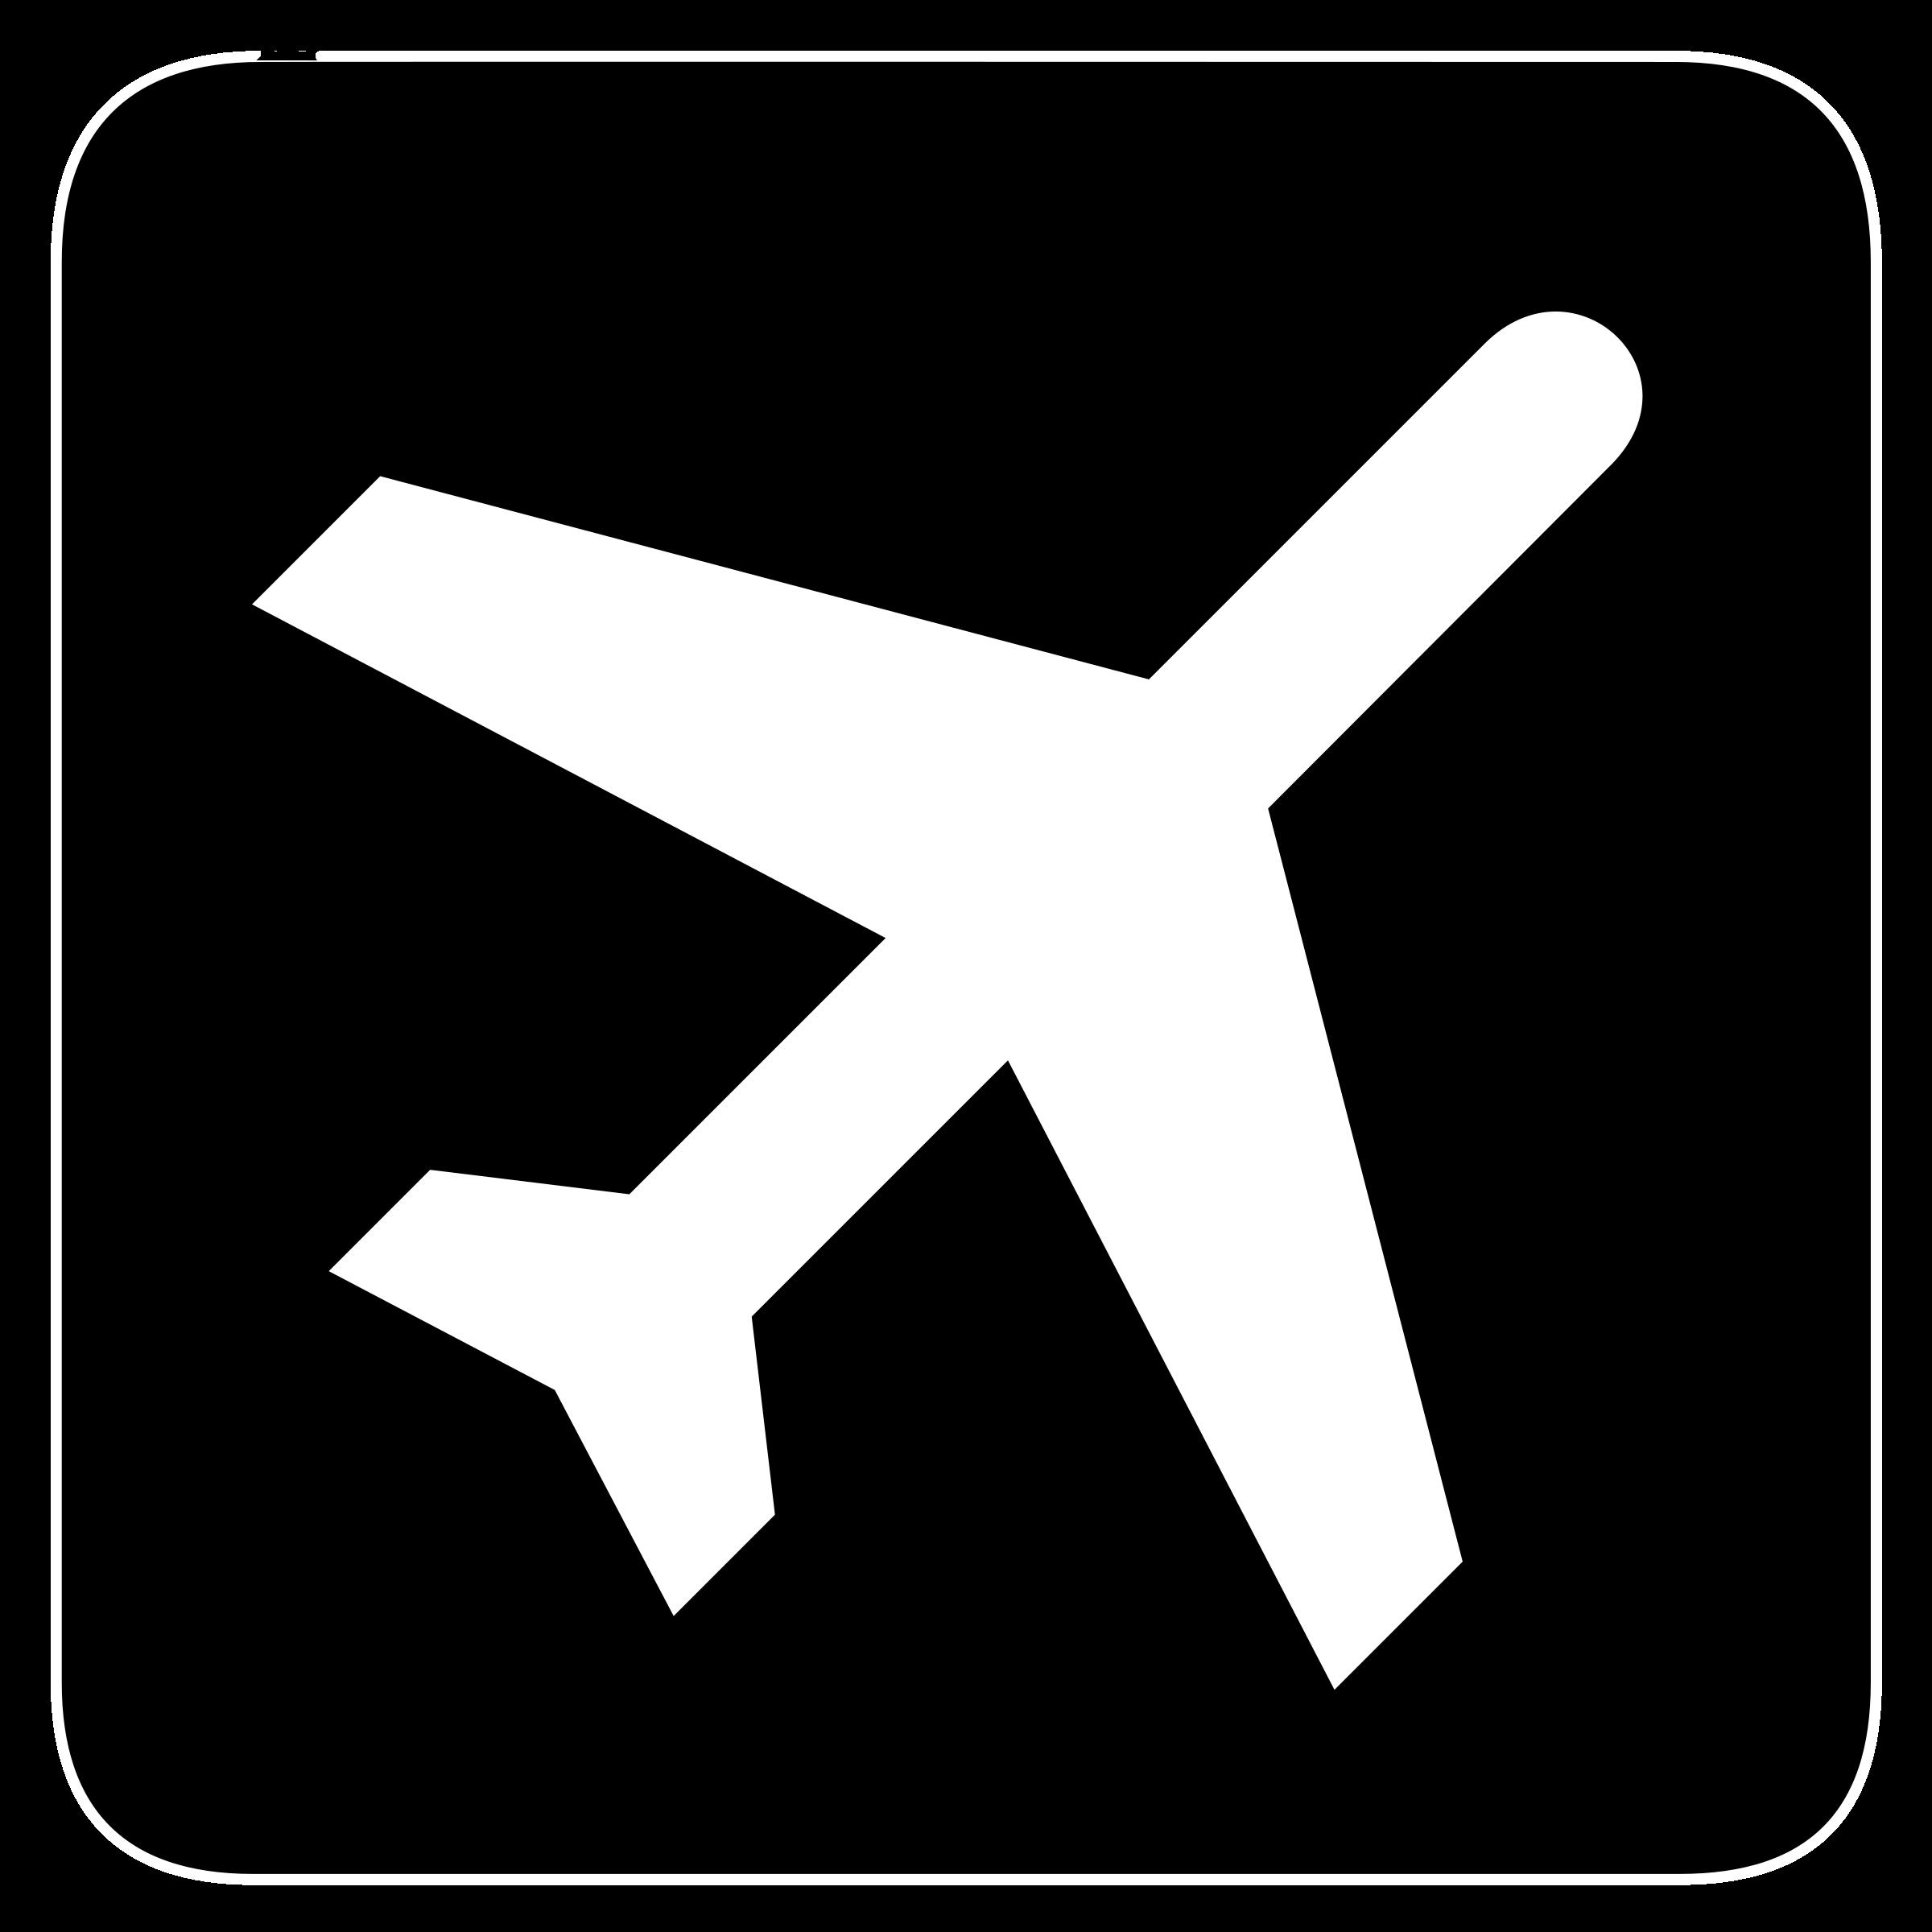 Airport clipart simbol. Aiga departures bg big